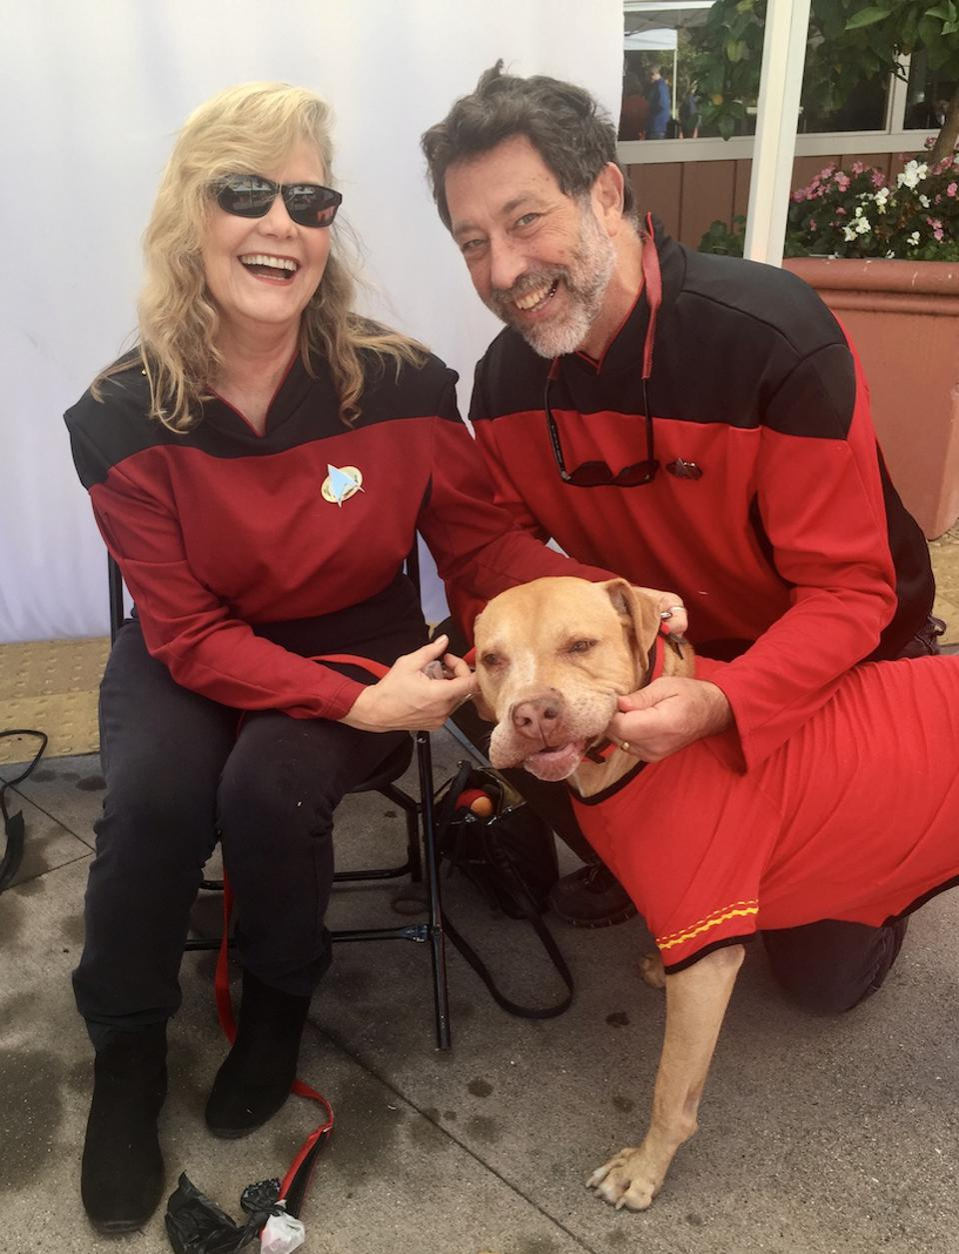 Rachelle Averbach, Steve Katz and their dog get dressed up in Star Trek uniforms.